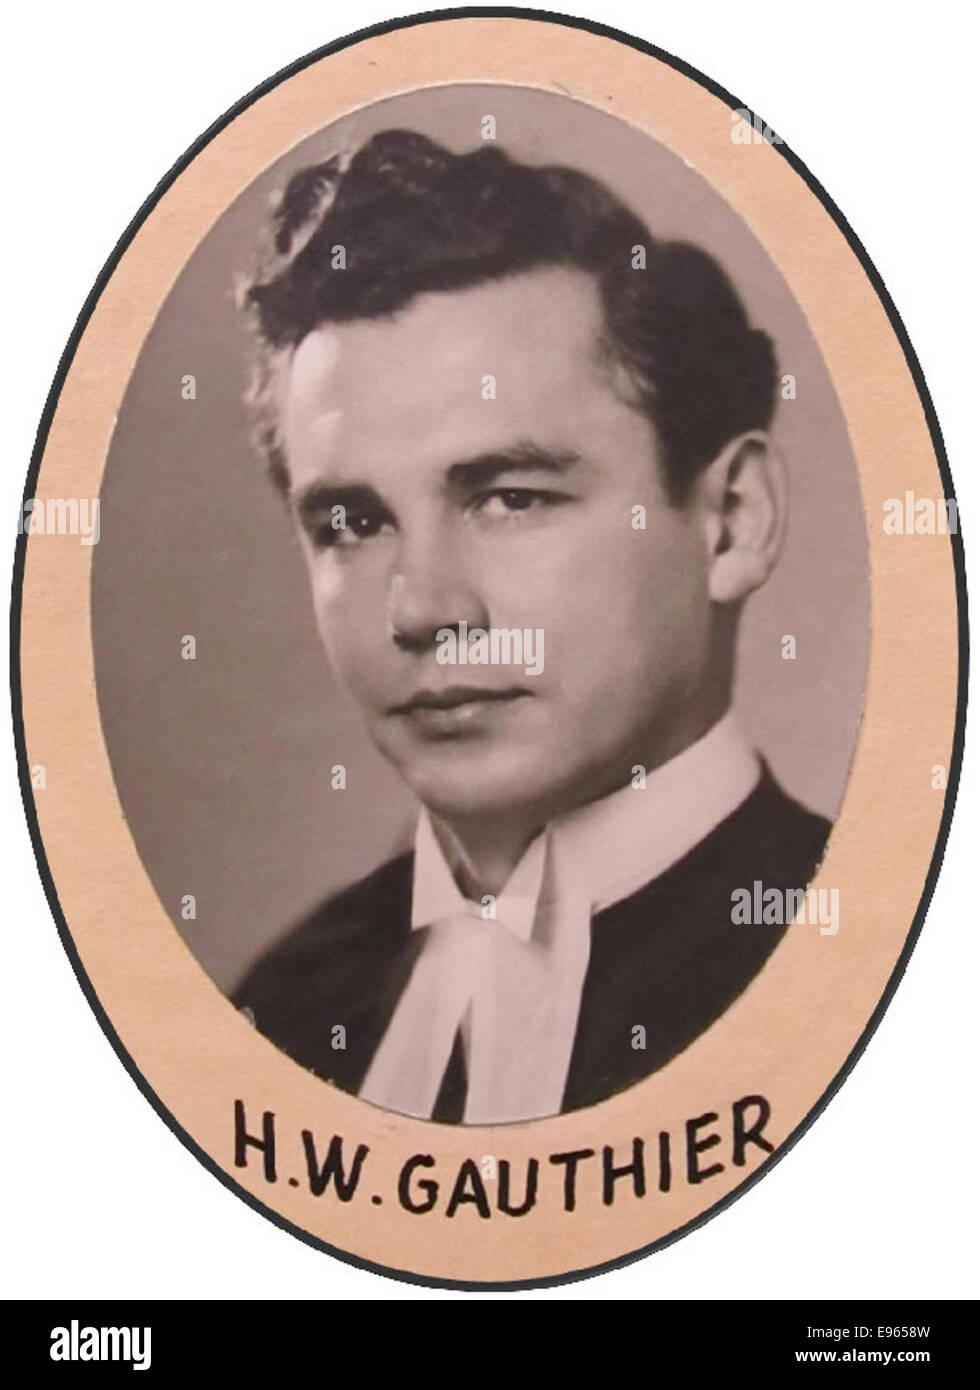 Photograph of <b>Harold Wood</b> Gauthier 49292724 o Stock Photo - photograph-of-harold-wood-gauthier-49292724-o-E9658W